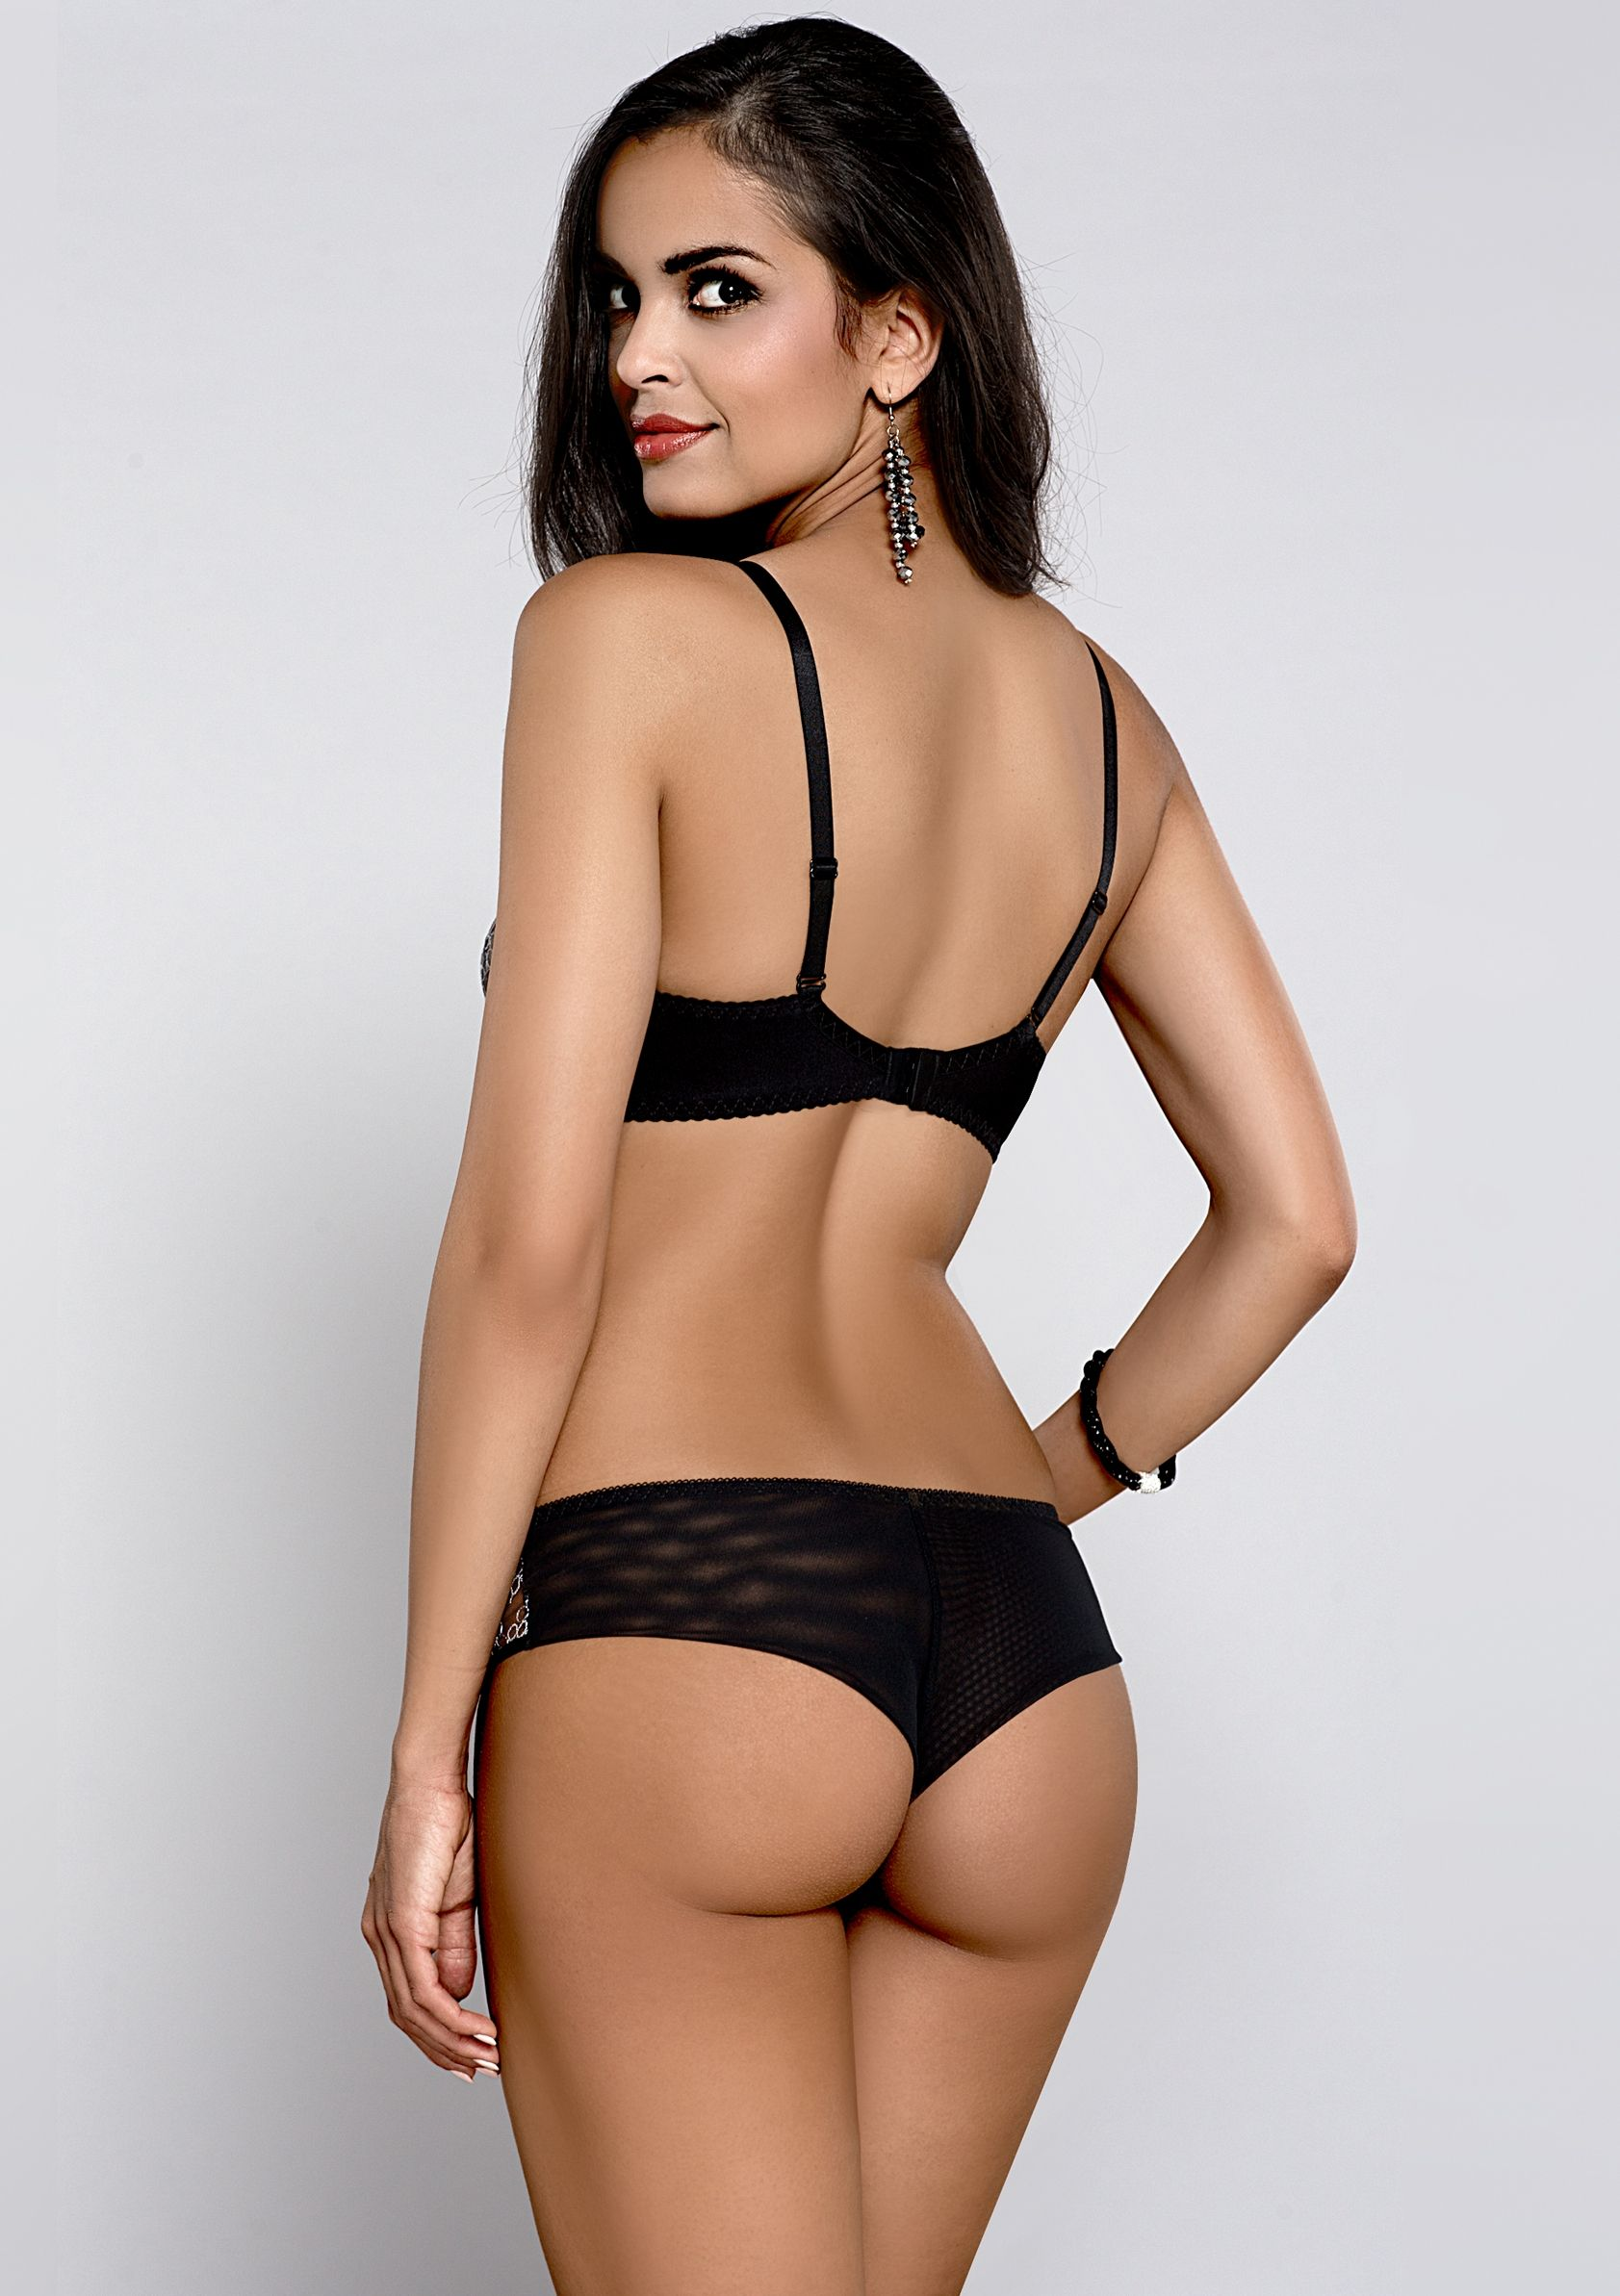 tesi push-up et string tanga   tesi ensemble de lingerie   pinterest